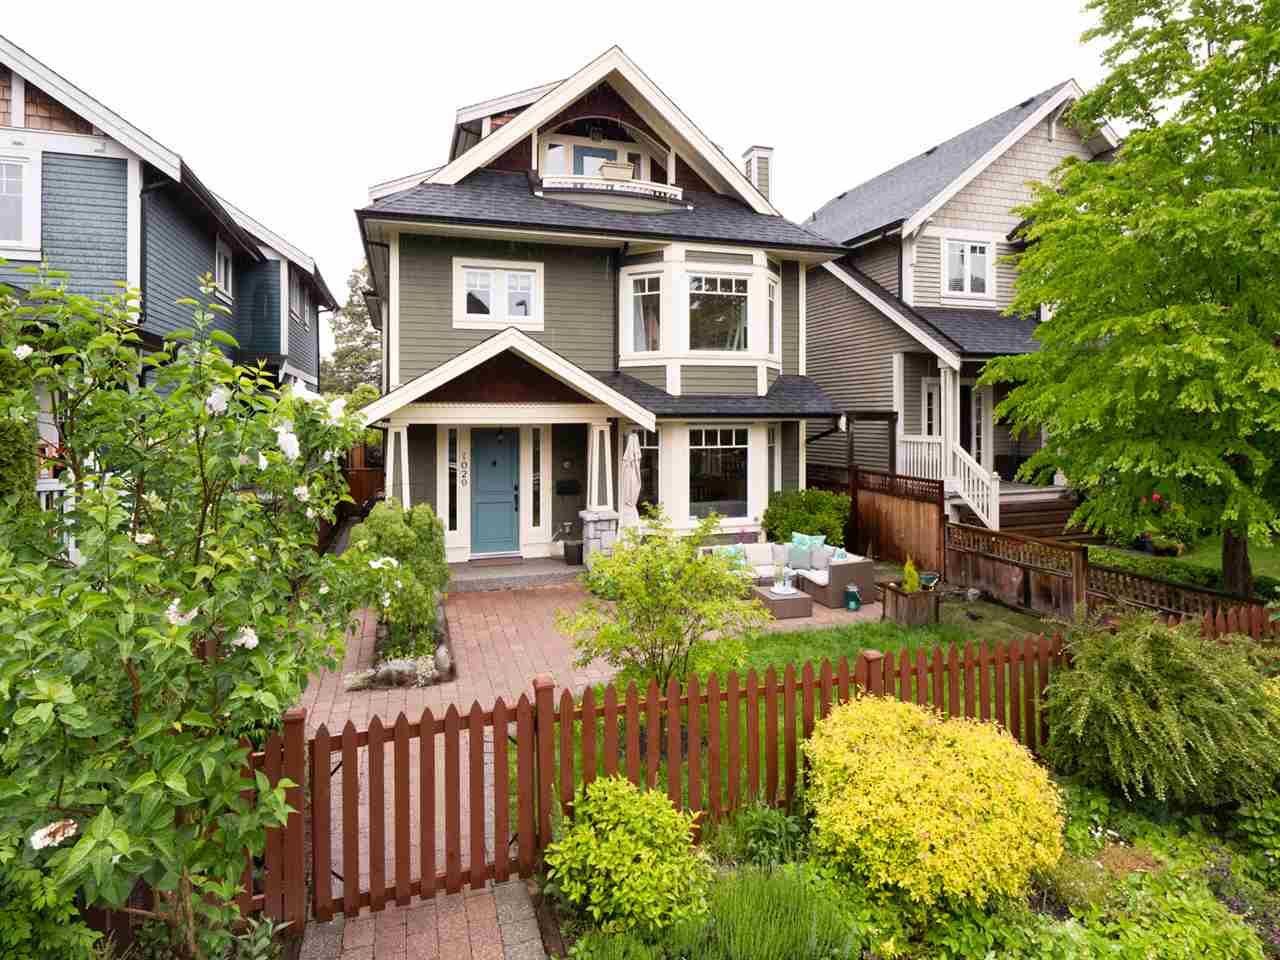 Main Photo: 1029 E 13TH Avenue in Vancouver: Mount Pleasant VE 1/2 Duplex for sale (Vancouver East)  : MLS®# R2369686